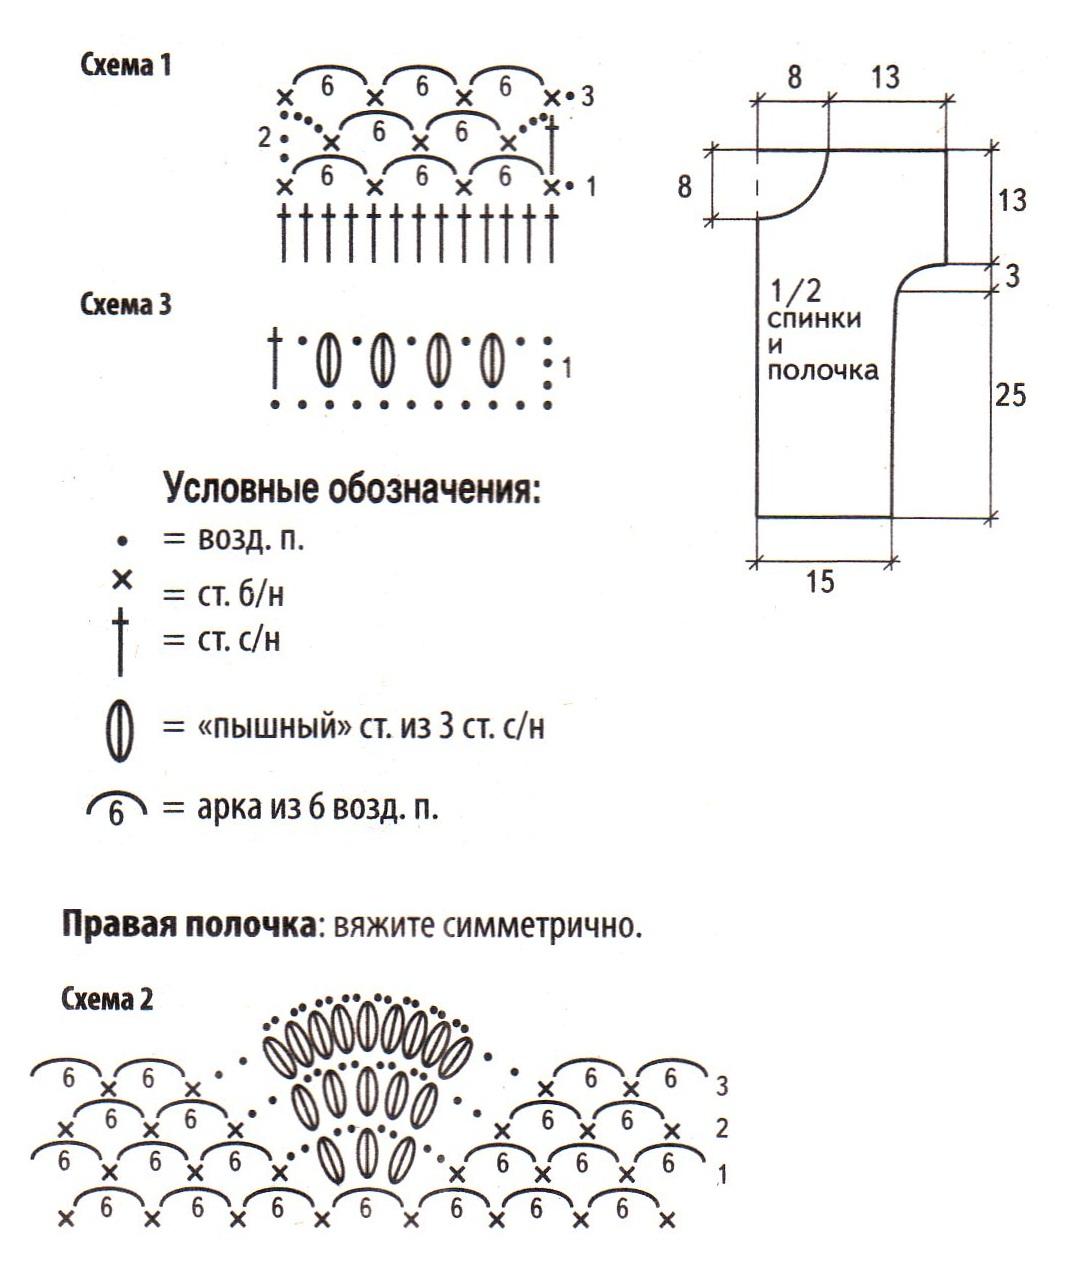 Сетчатый жакет вязаный крючком схема